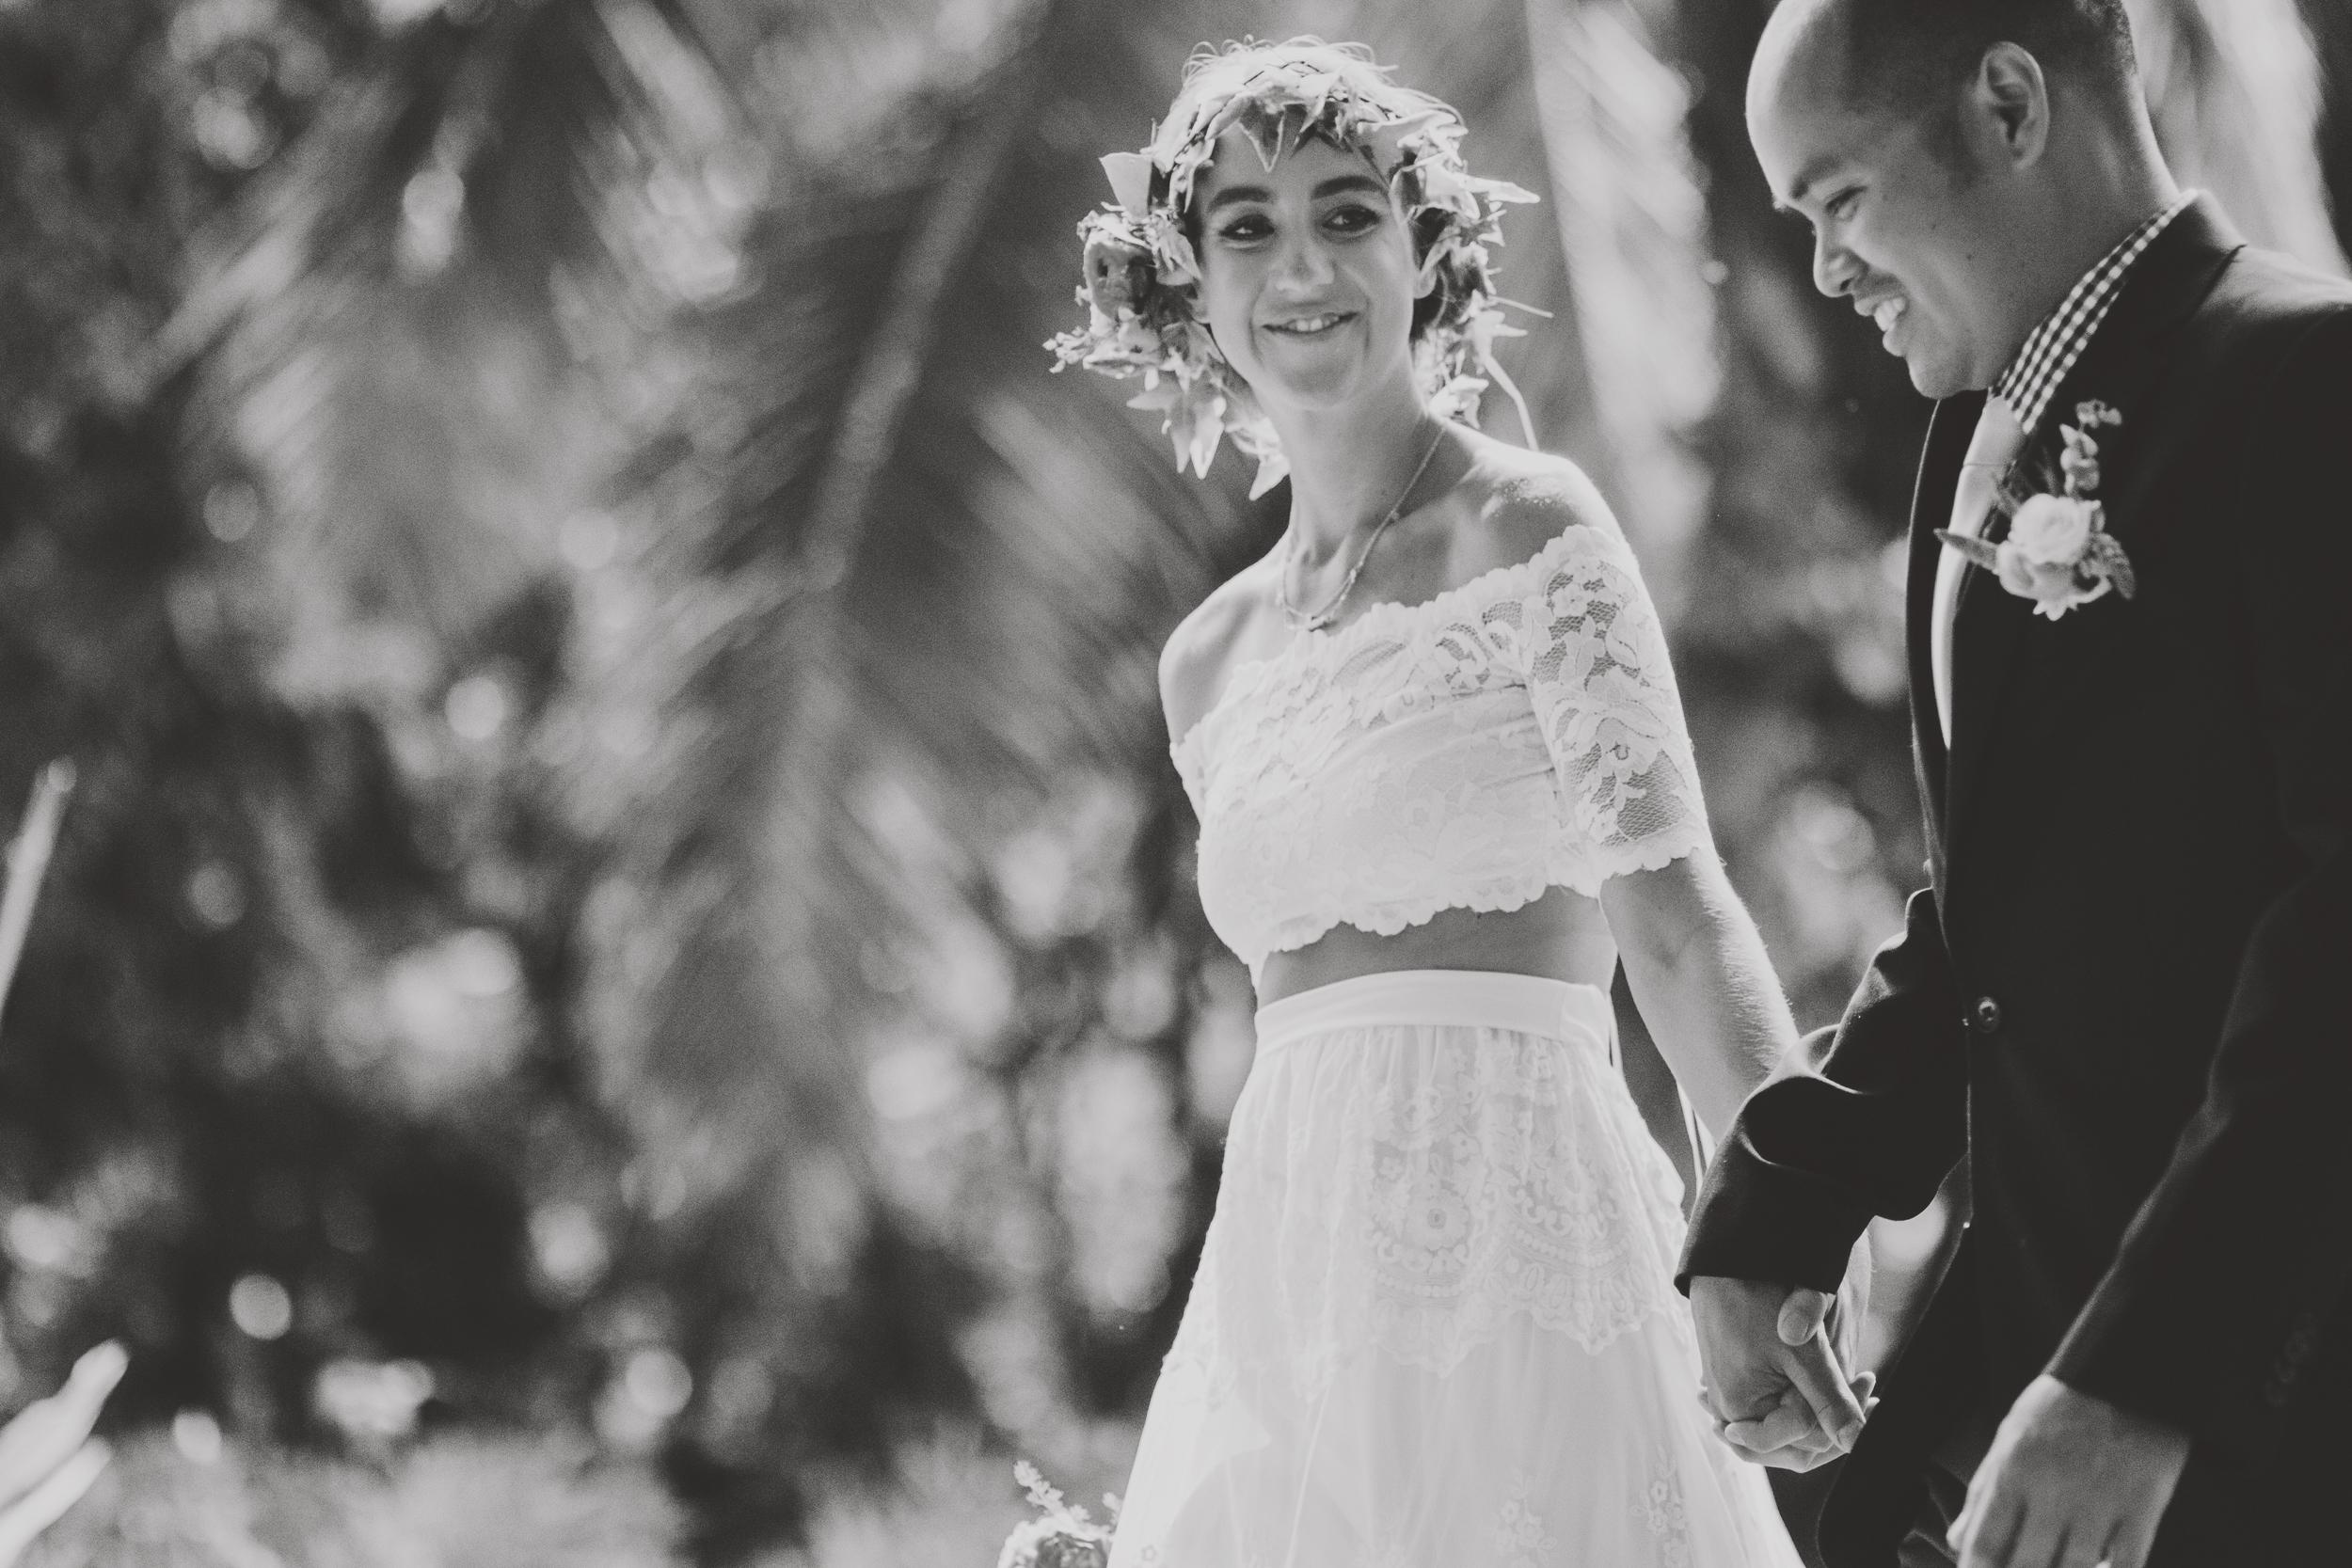 angie-diaz-photography-oahu-hawaii-wedding-tradewinds-ranch-69.jpg